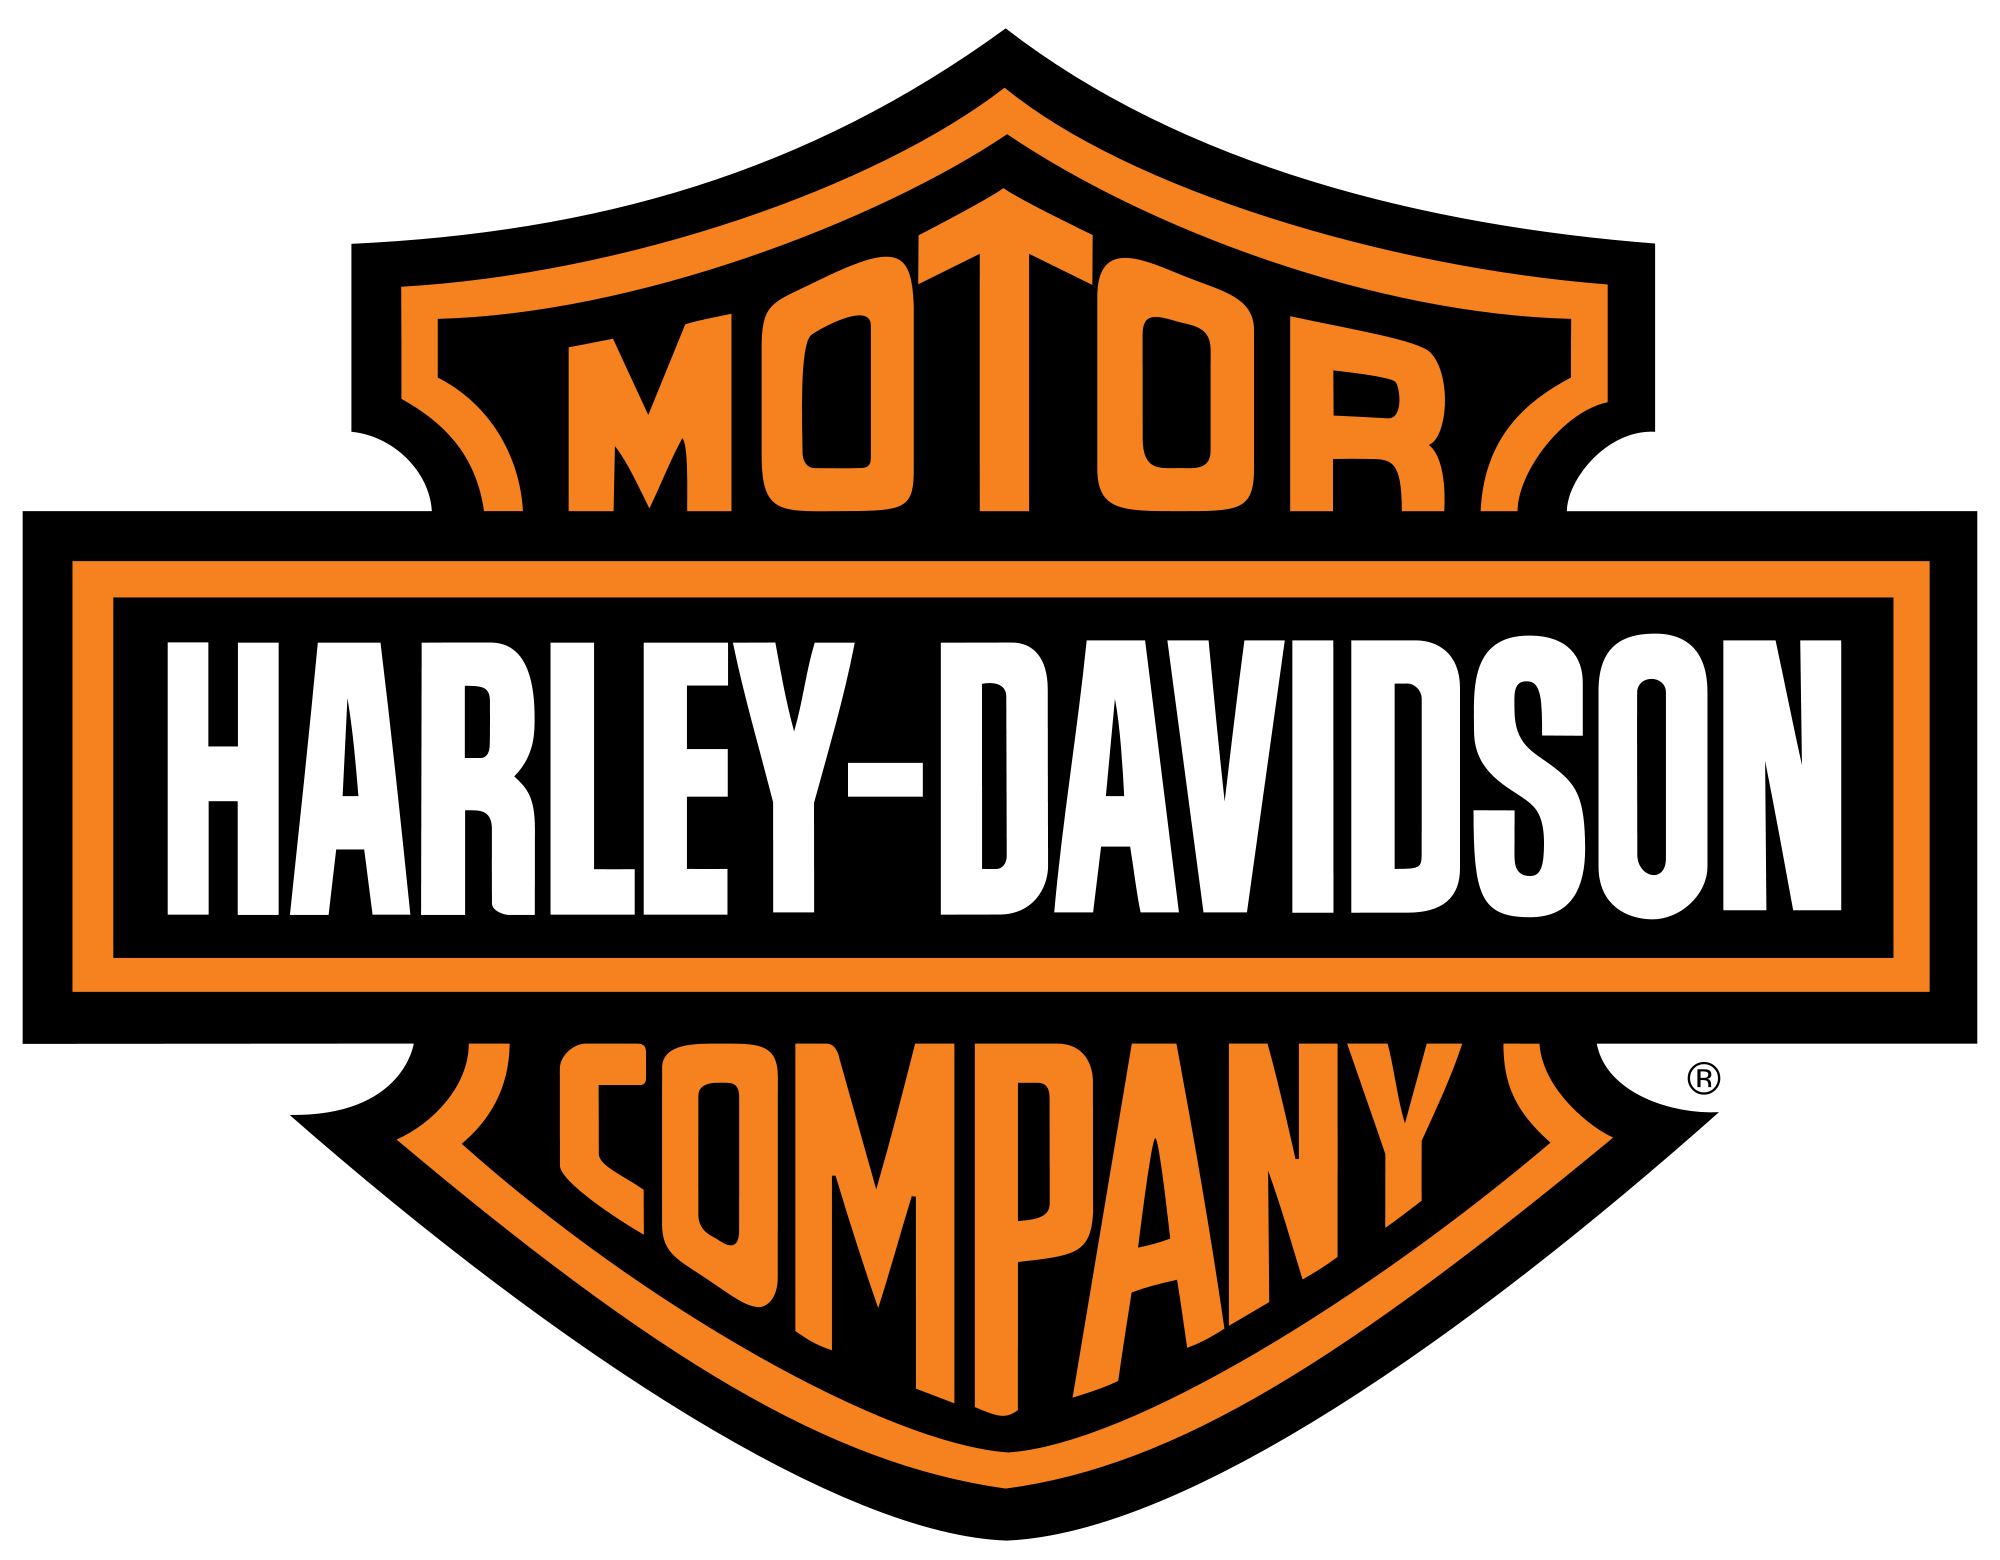 Harley Davidson Logo PNG Image.